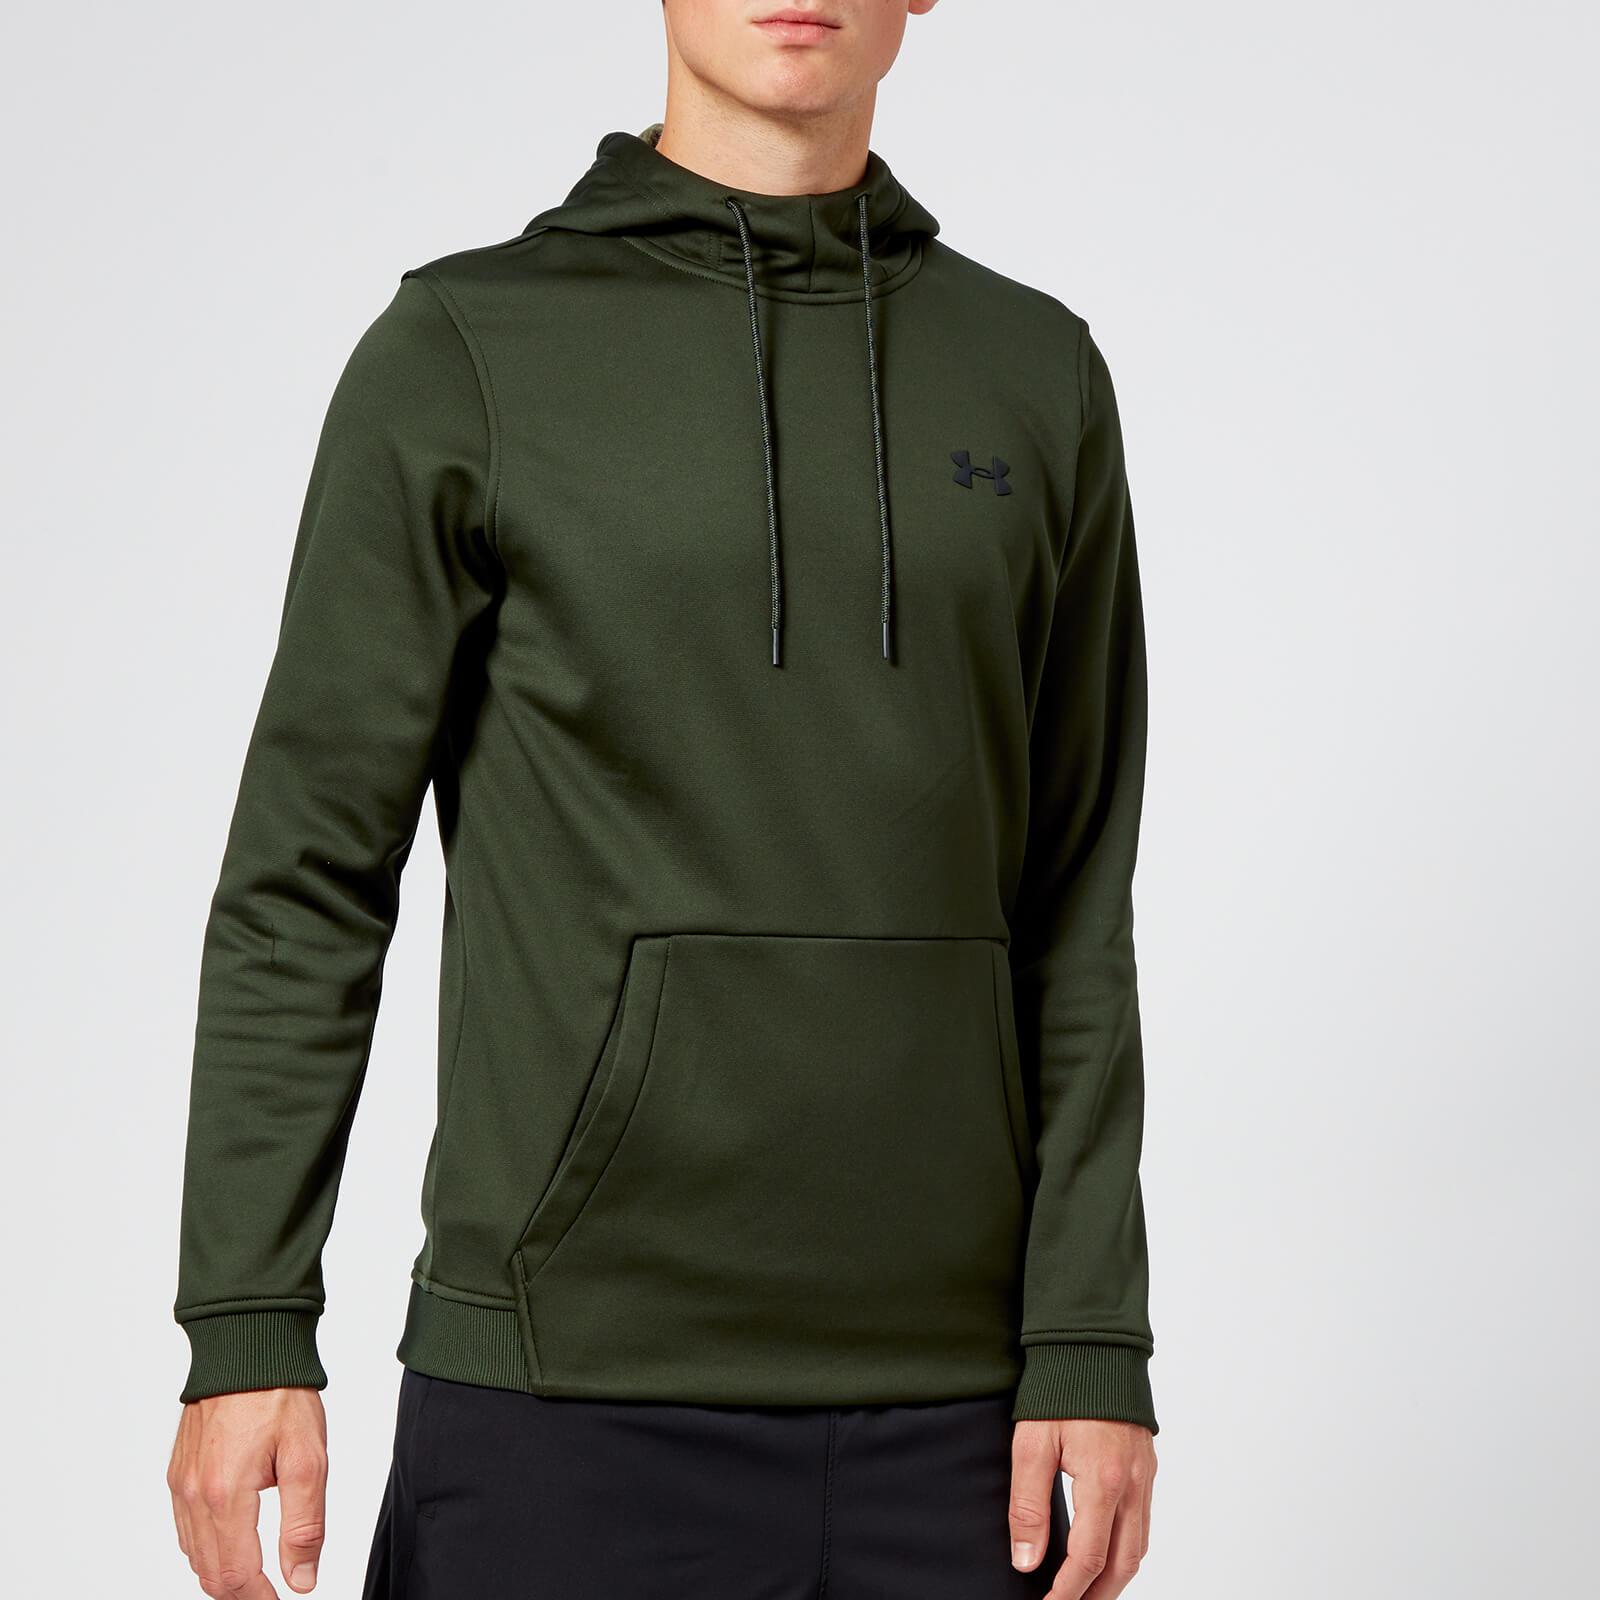 under armour green hoodie